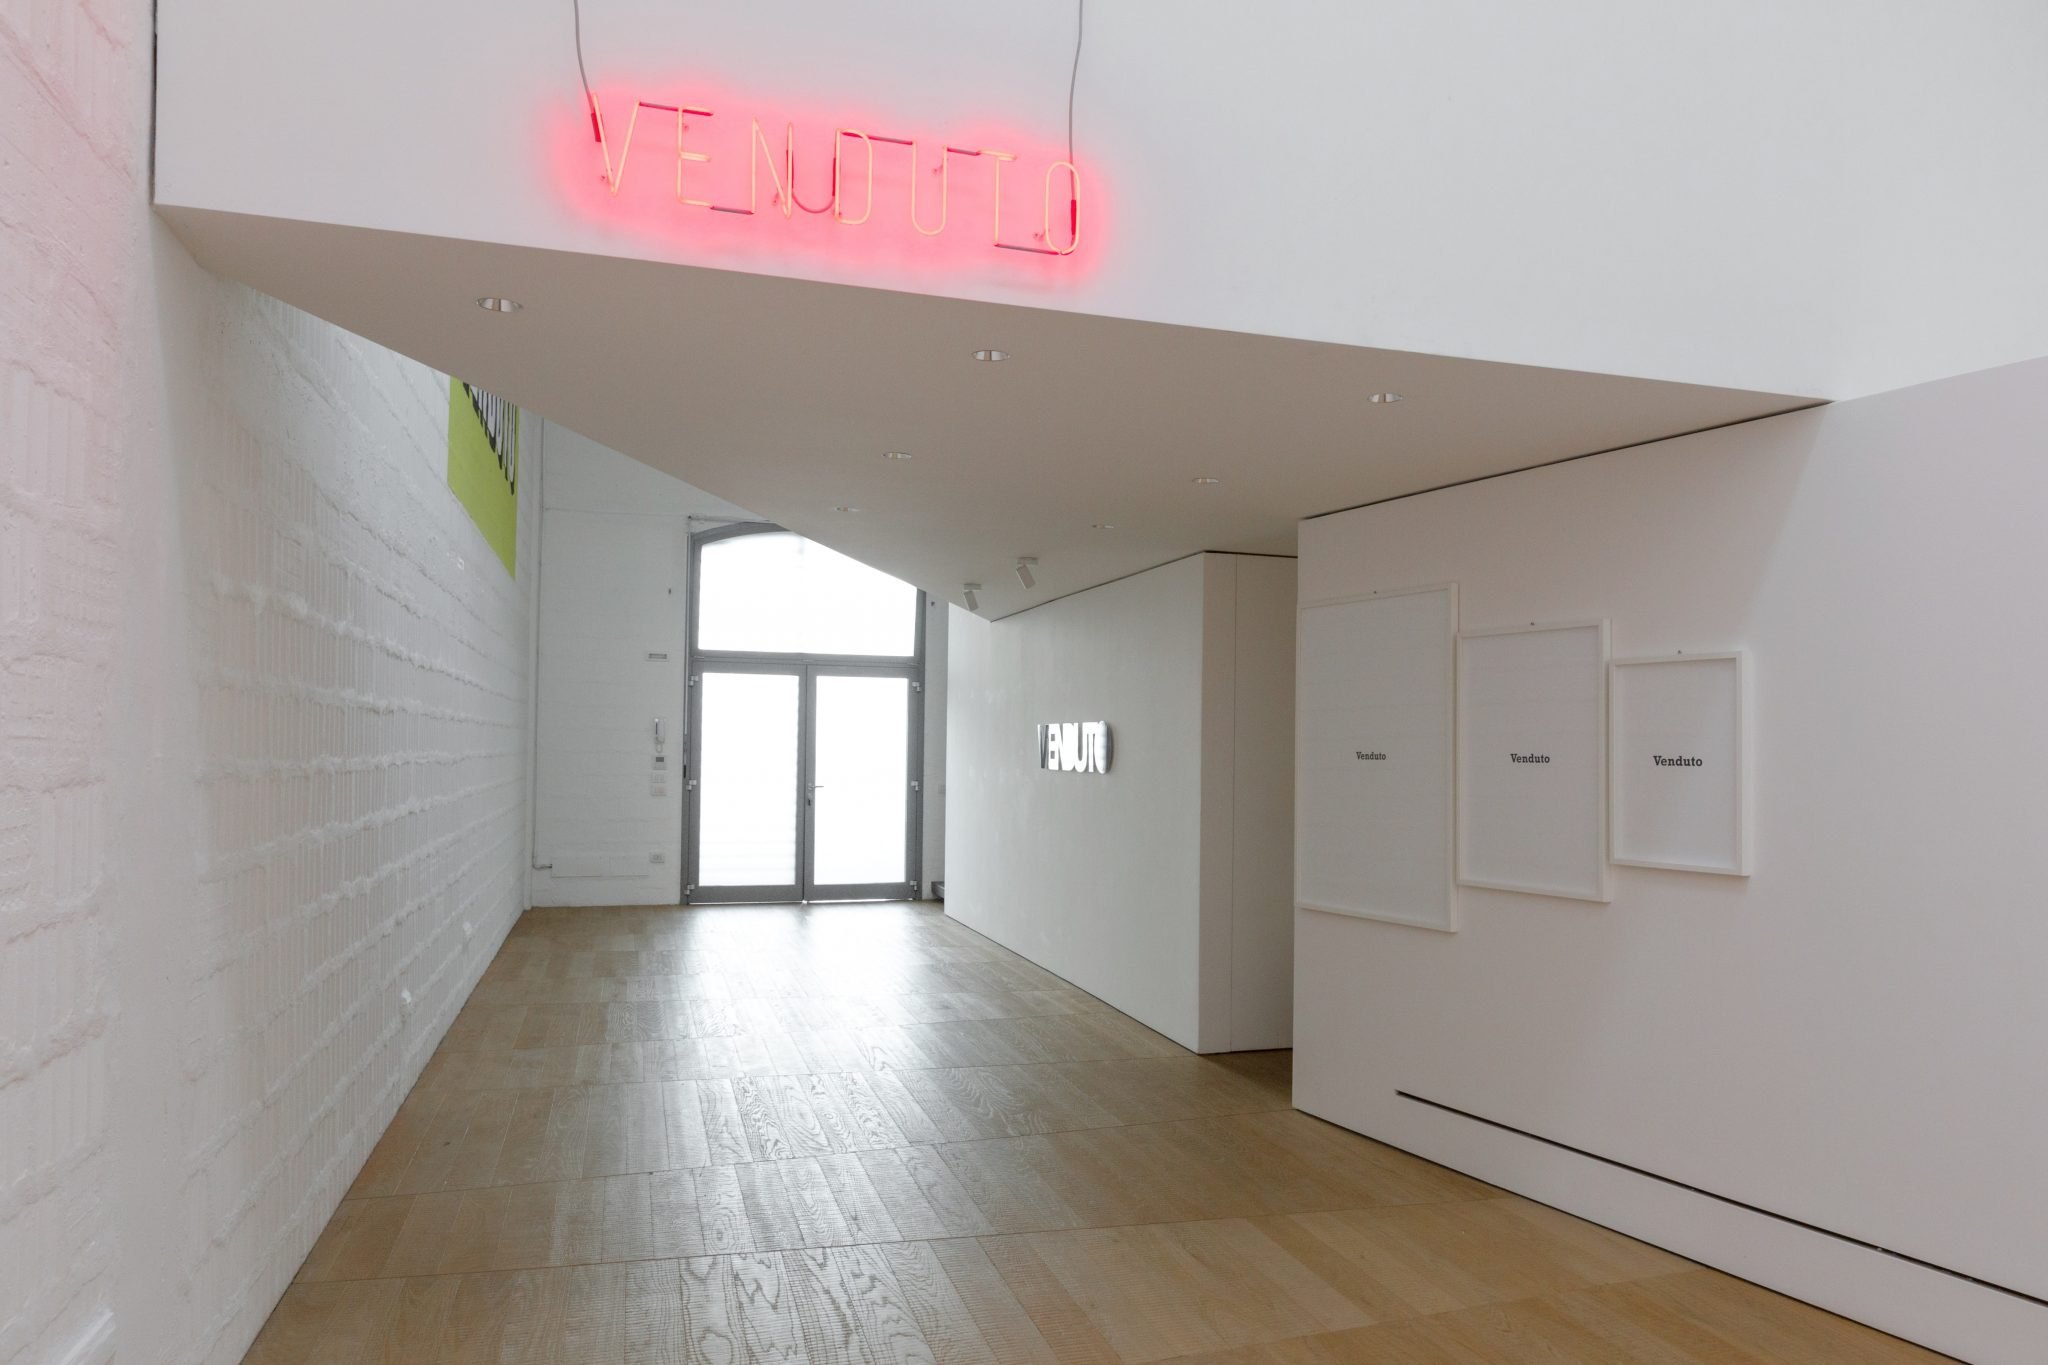 Matteo Attruia, Galleria Massimodeluca